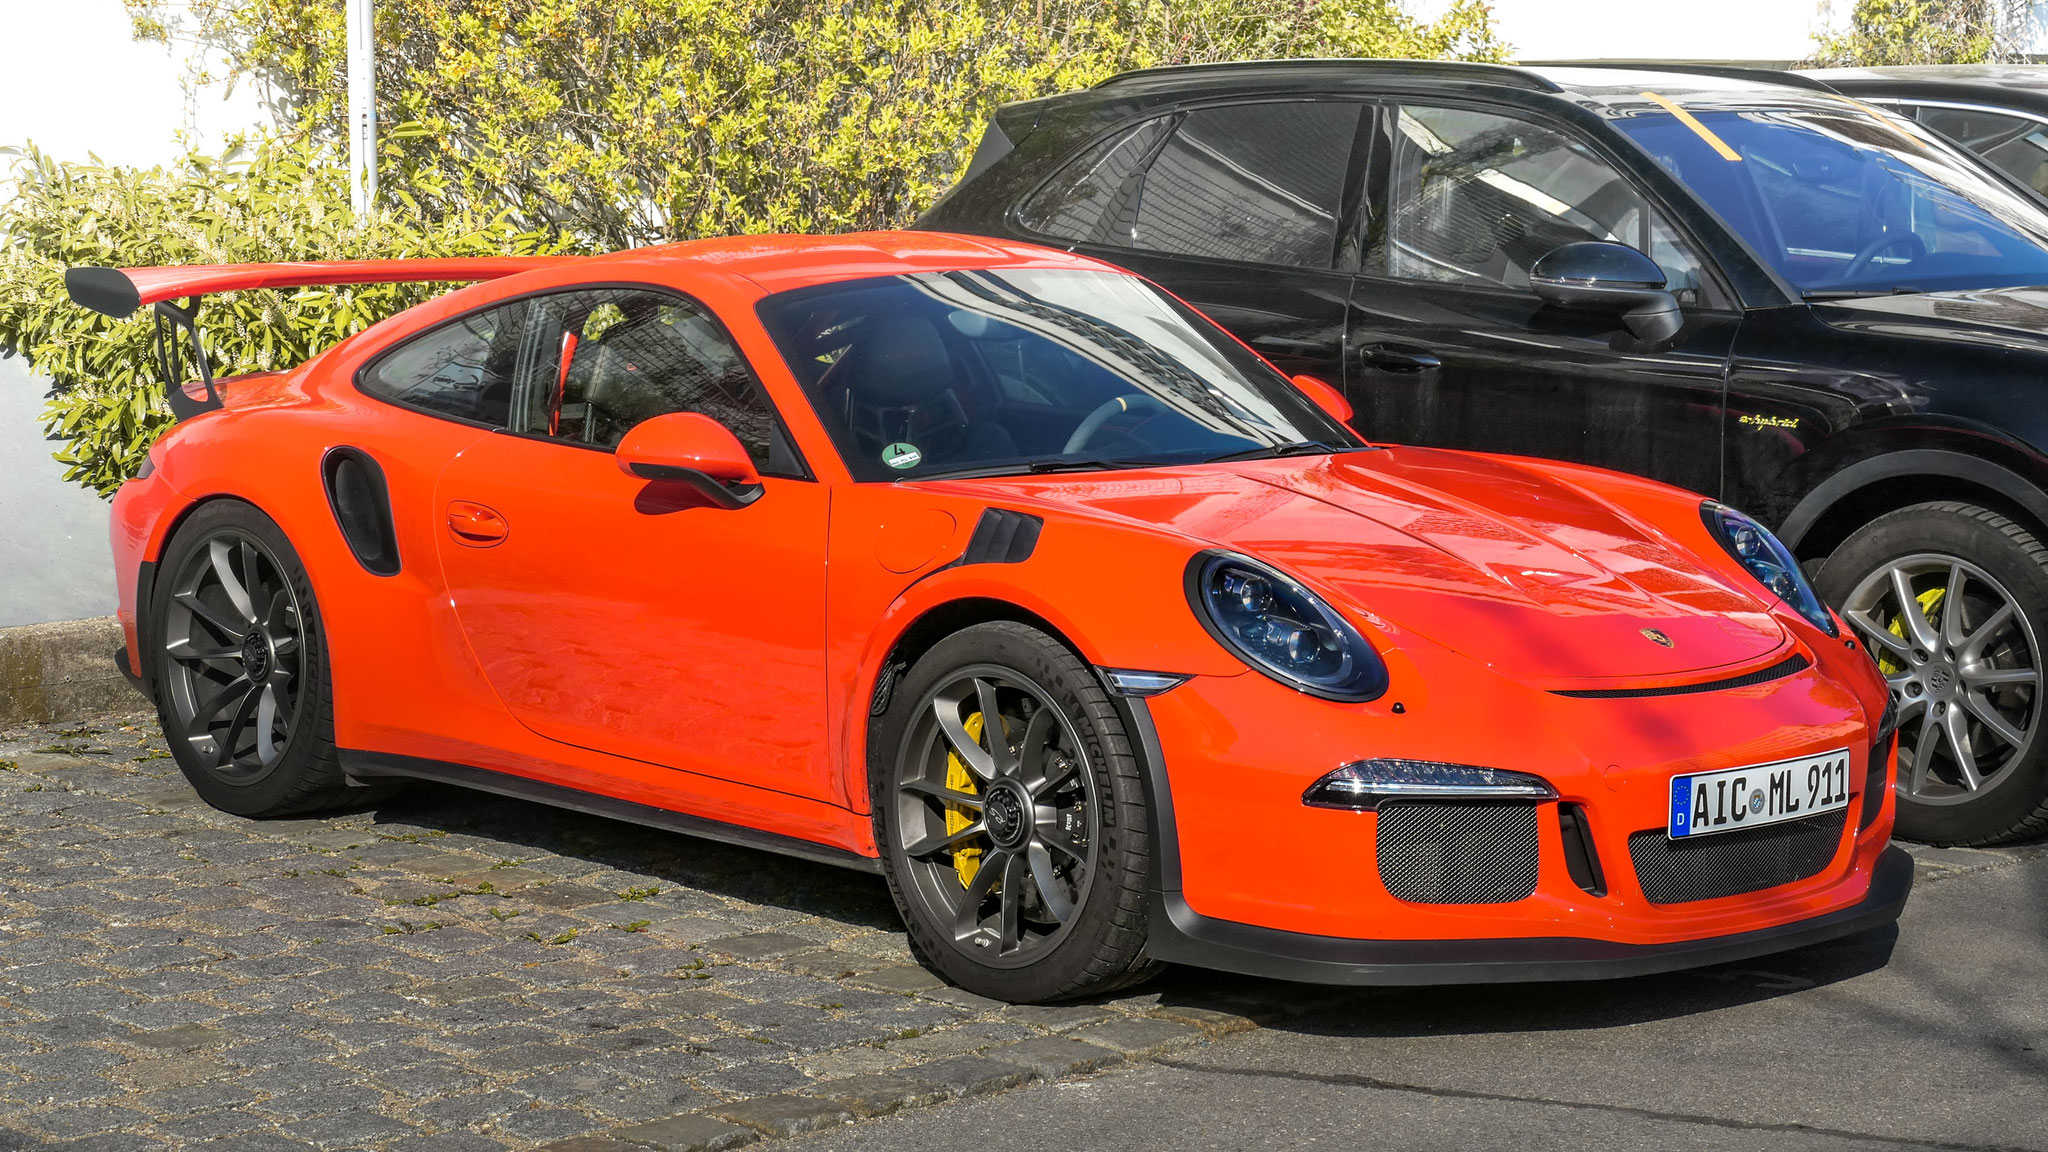 Porsche 911 GT3 RS - AIC-ML-911